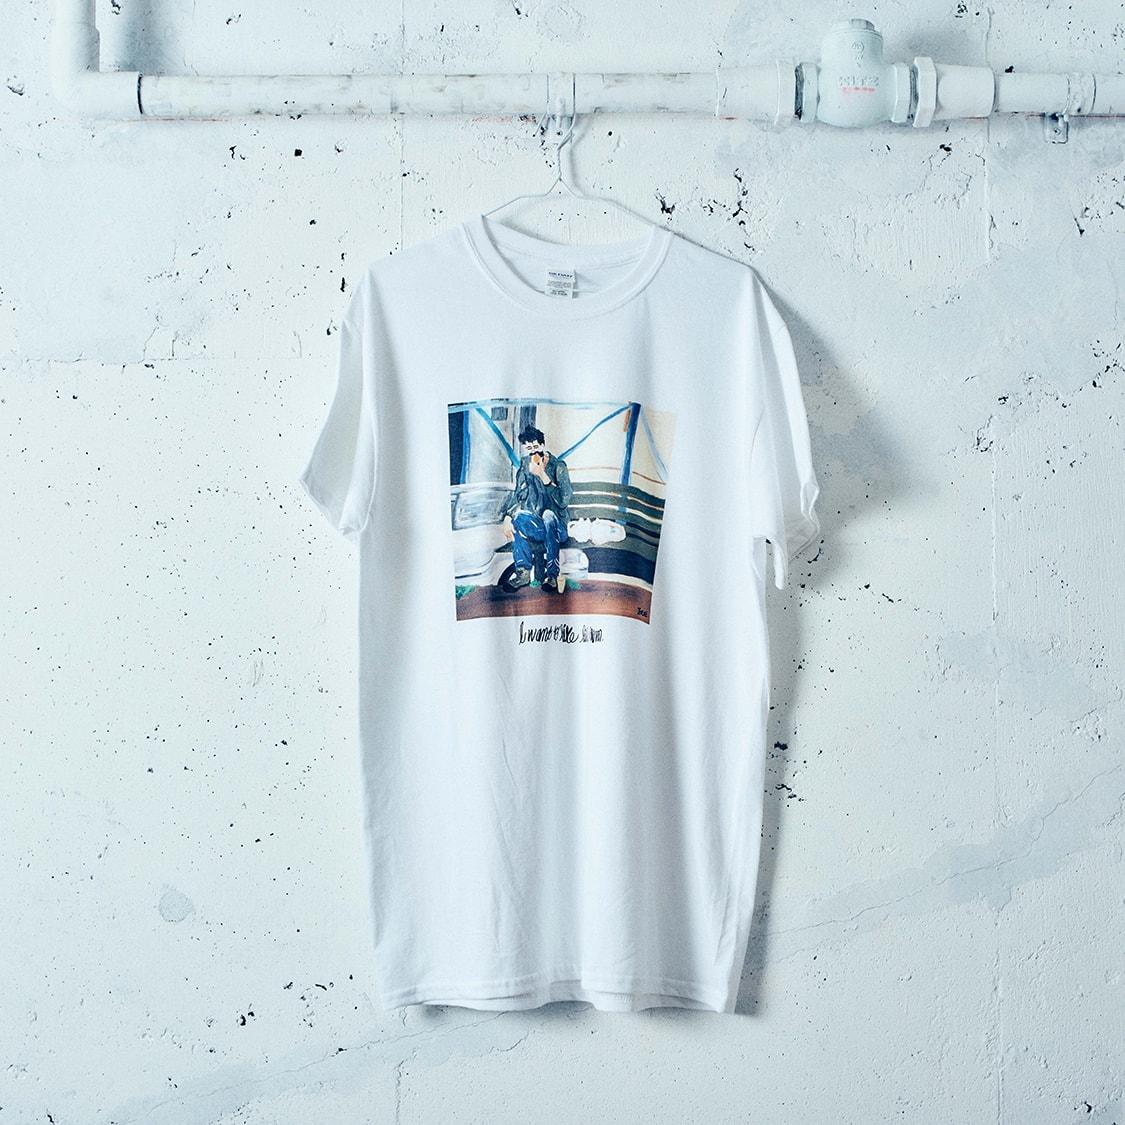 norahi×TENDREコラボレーションTシャツ「BENCH-T」